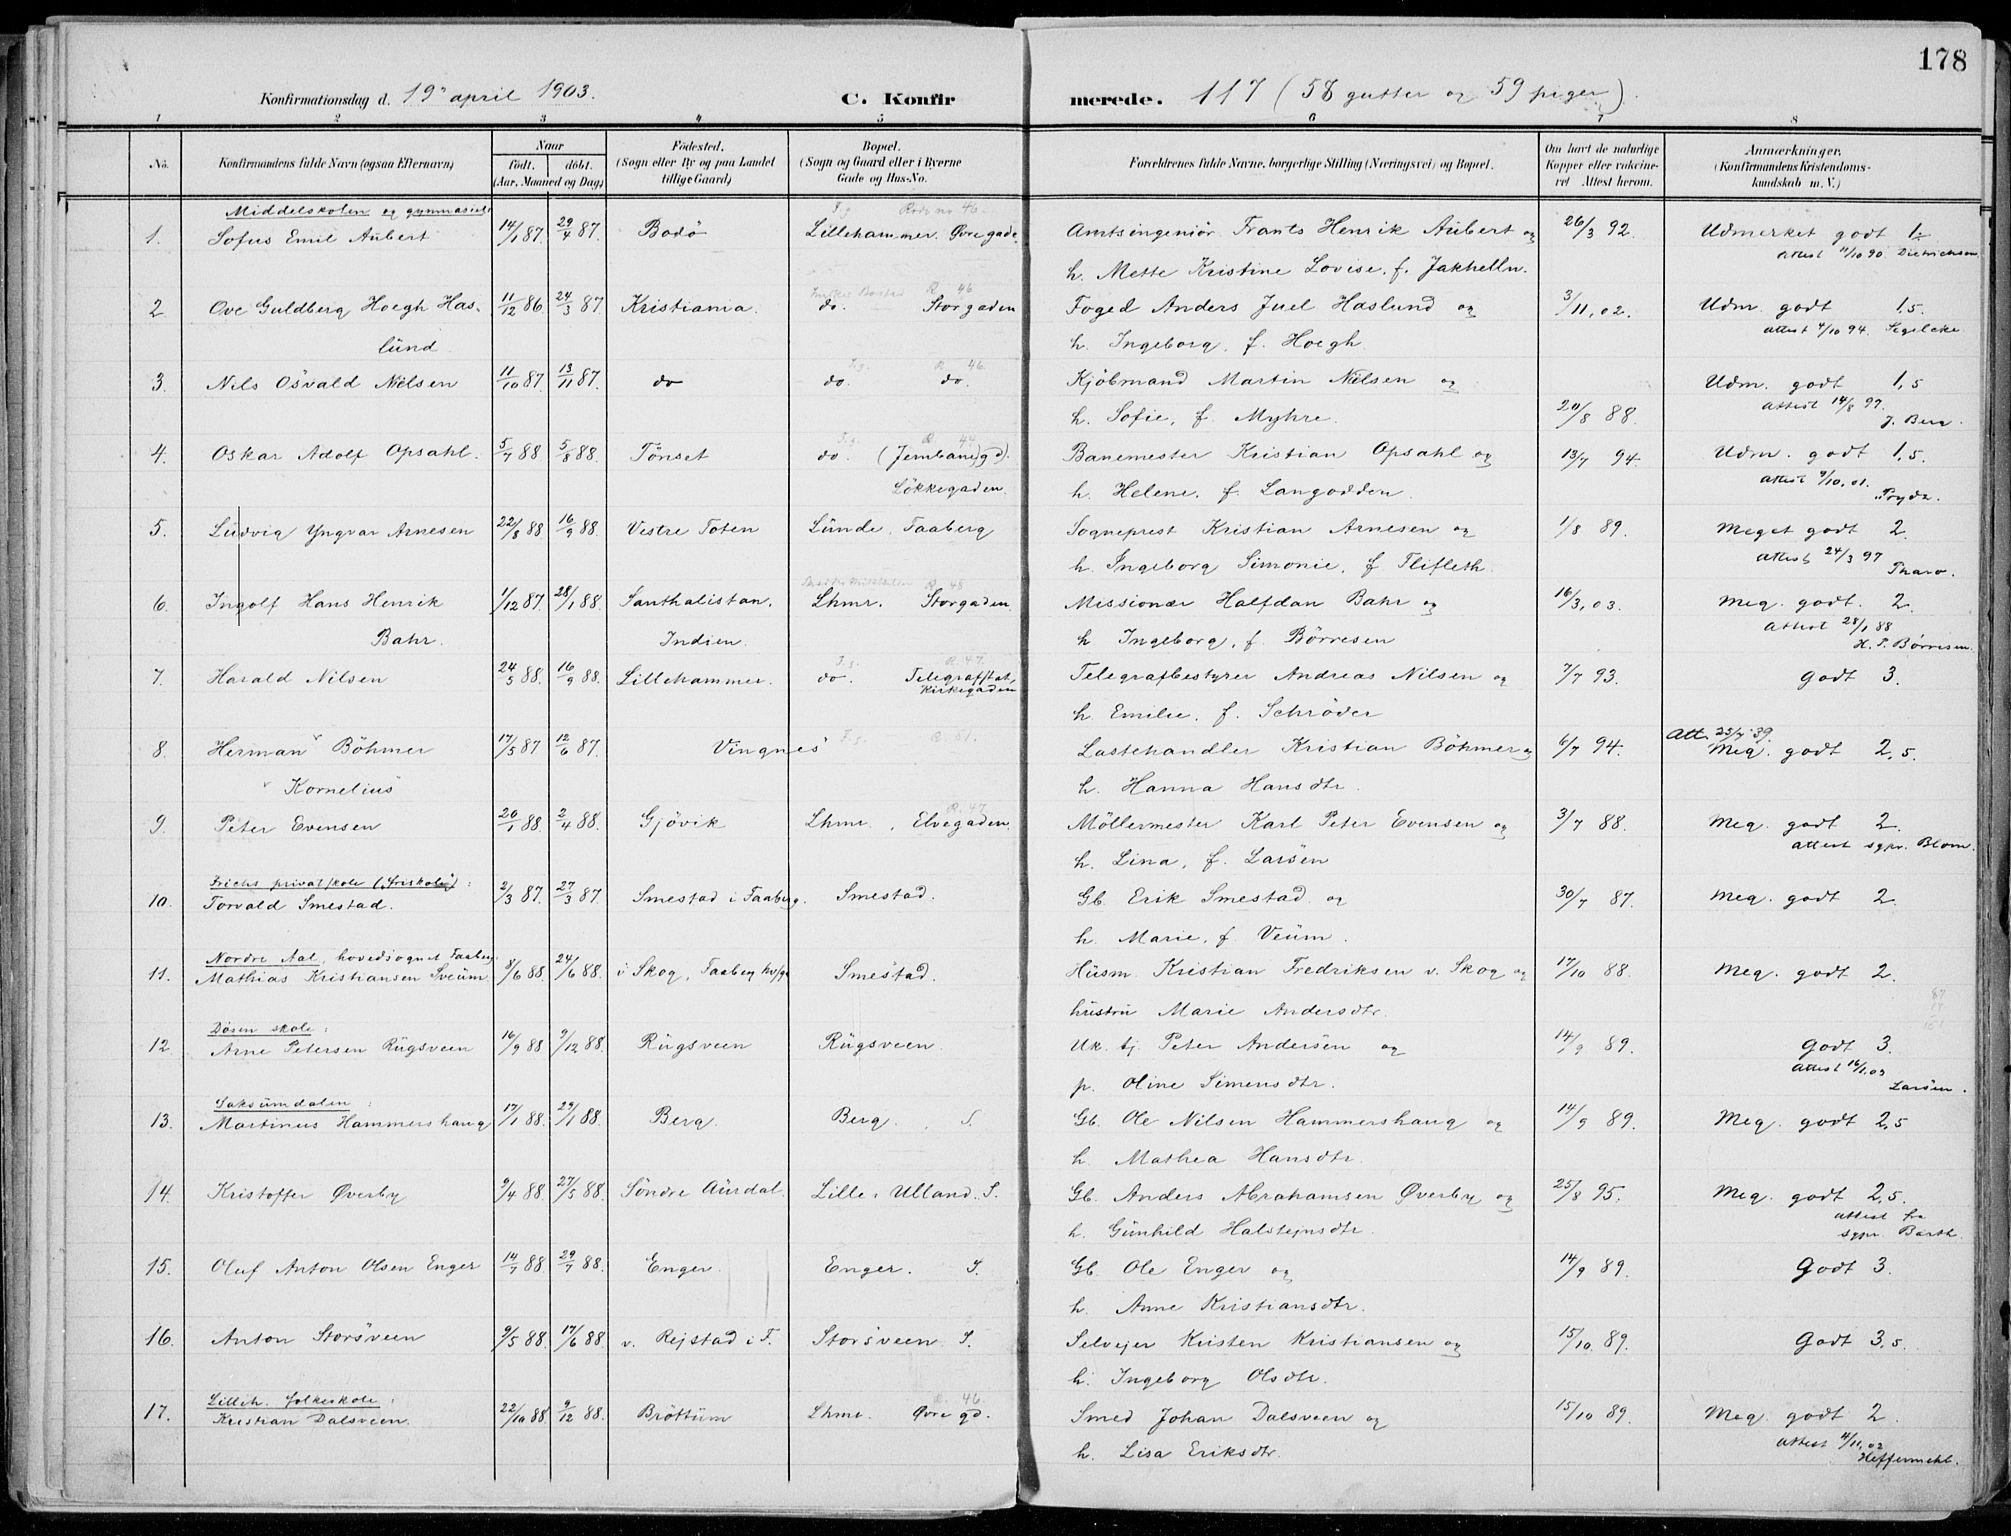 SAH, Lillehammer prestekontor, Ministerialbok nr. 1, 1901-1916, s. 178